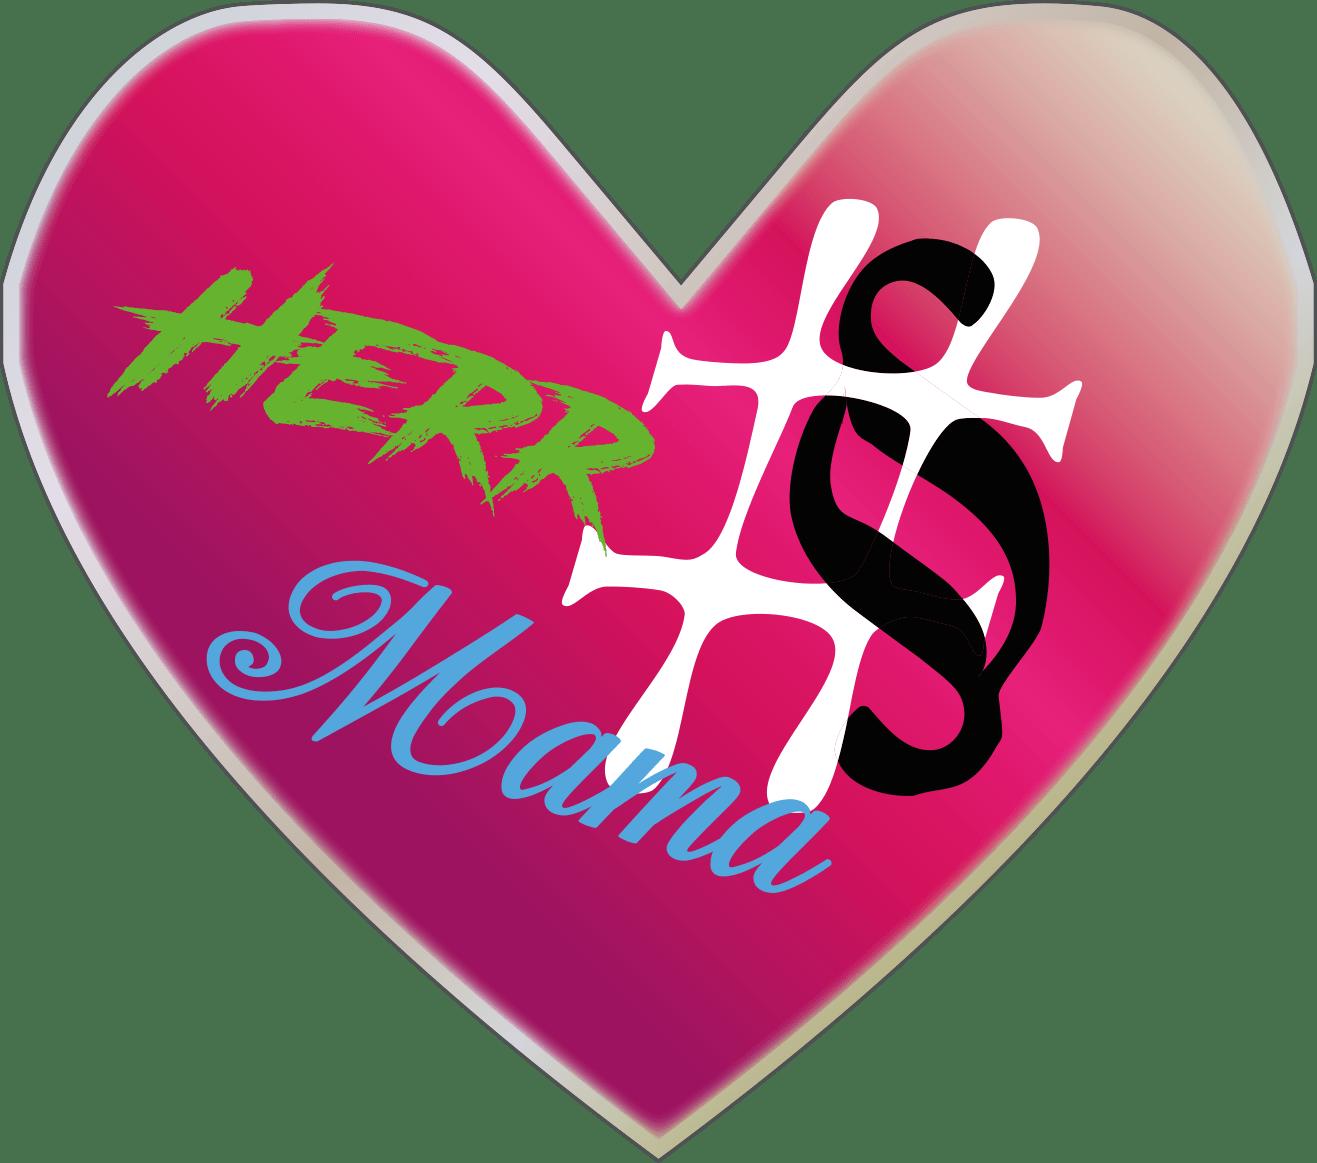 Herr Mama – Papa aus Leidenschaft